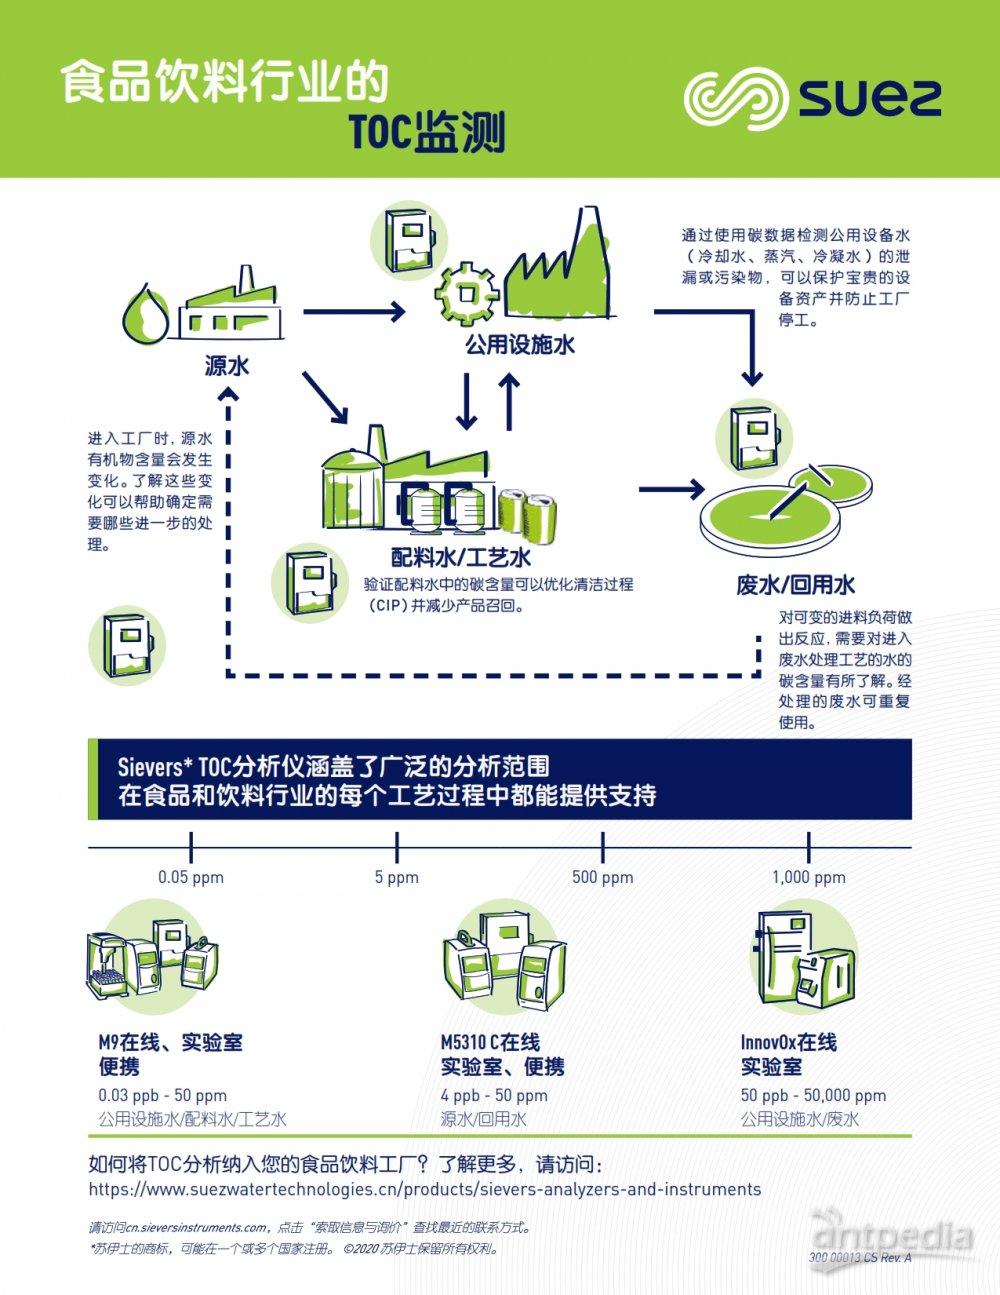 300 00013 CS - TOC in Food & Bev Infographic_001.jpg